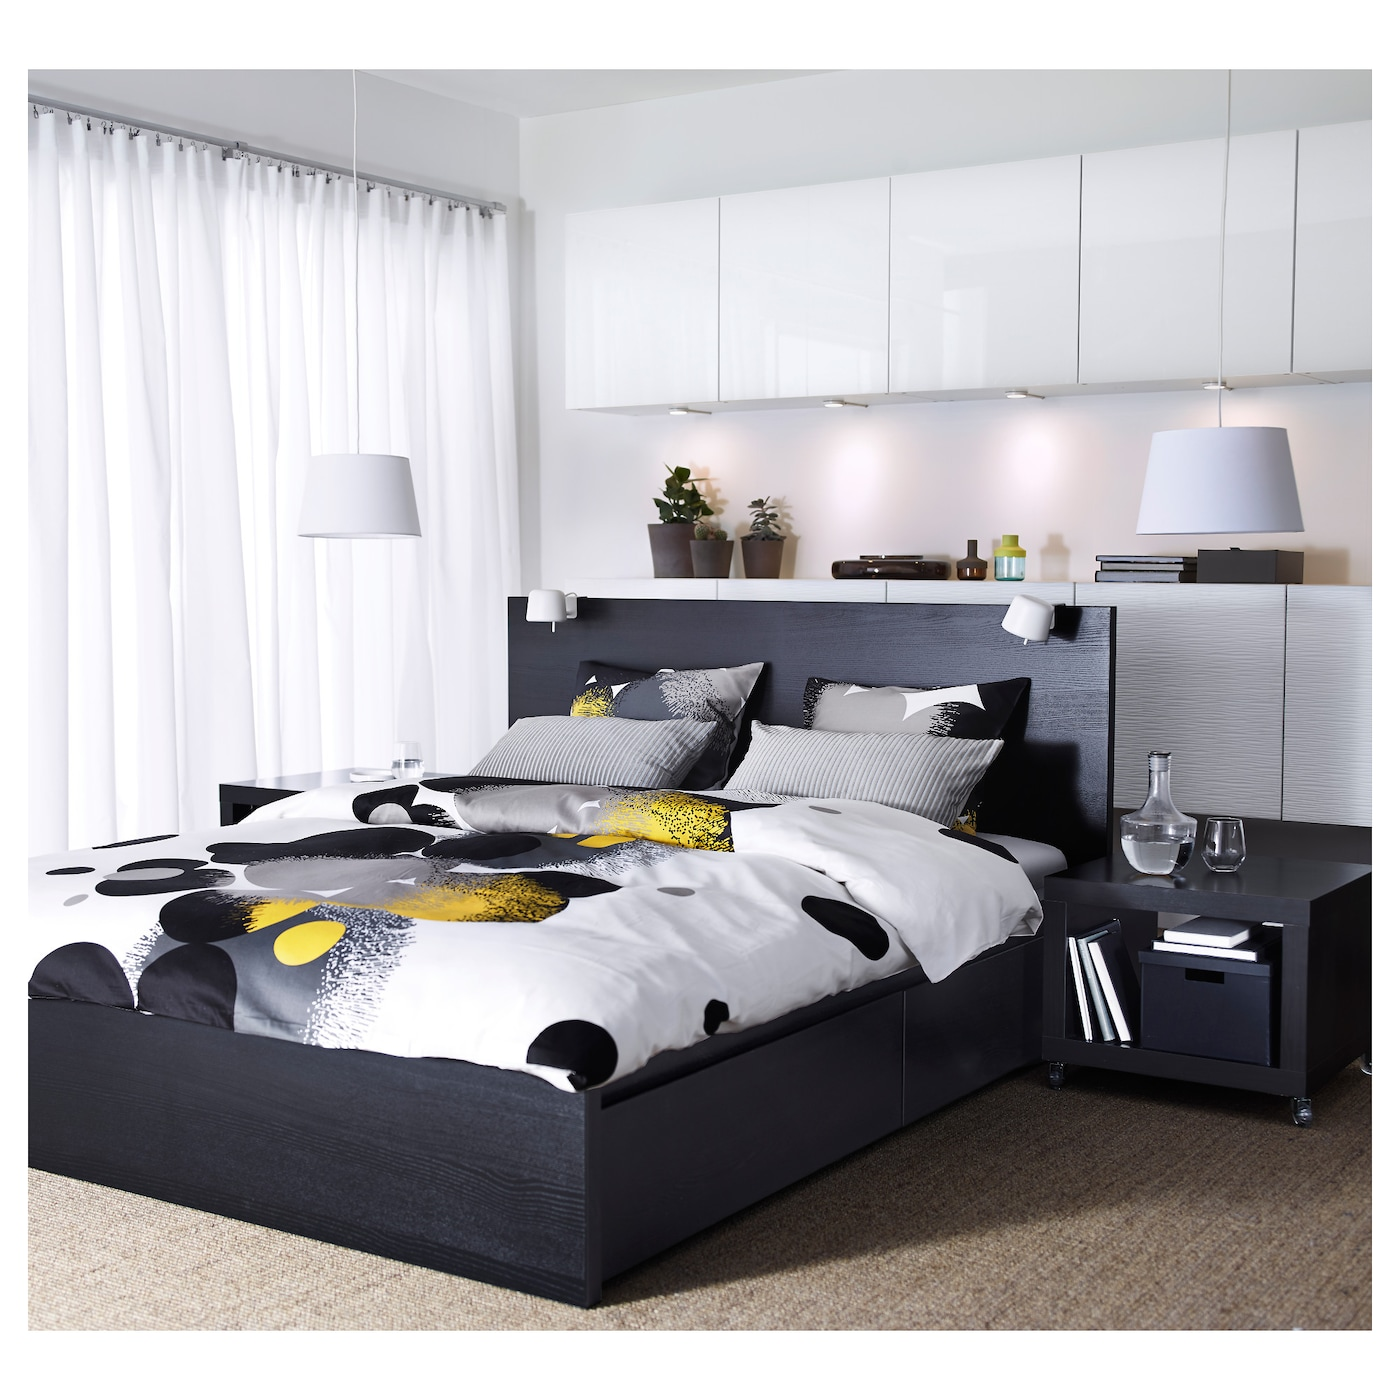 Malm bed frame high w 2 storage boxes black brownlury 140x200 ikea malm bed frame high w 2 storage boxes real wood veneer will make jeuxipadfo Choice Image